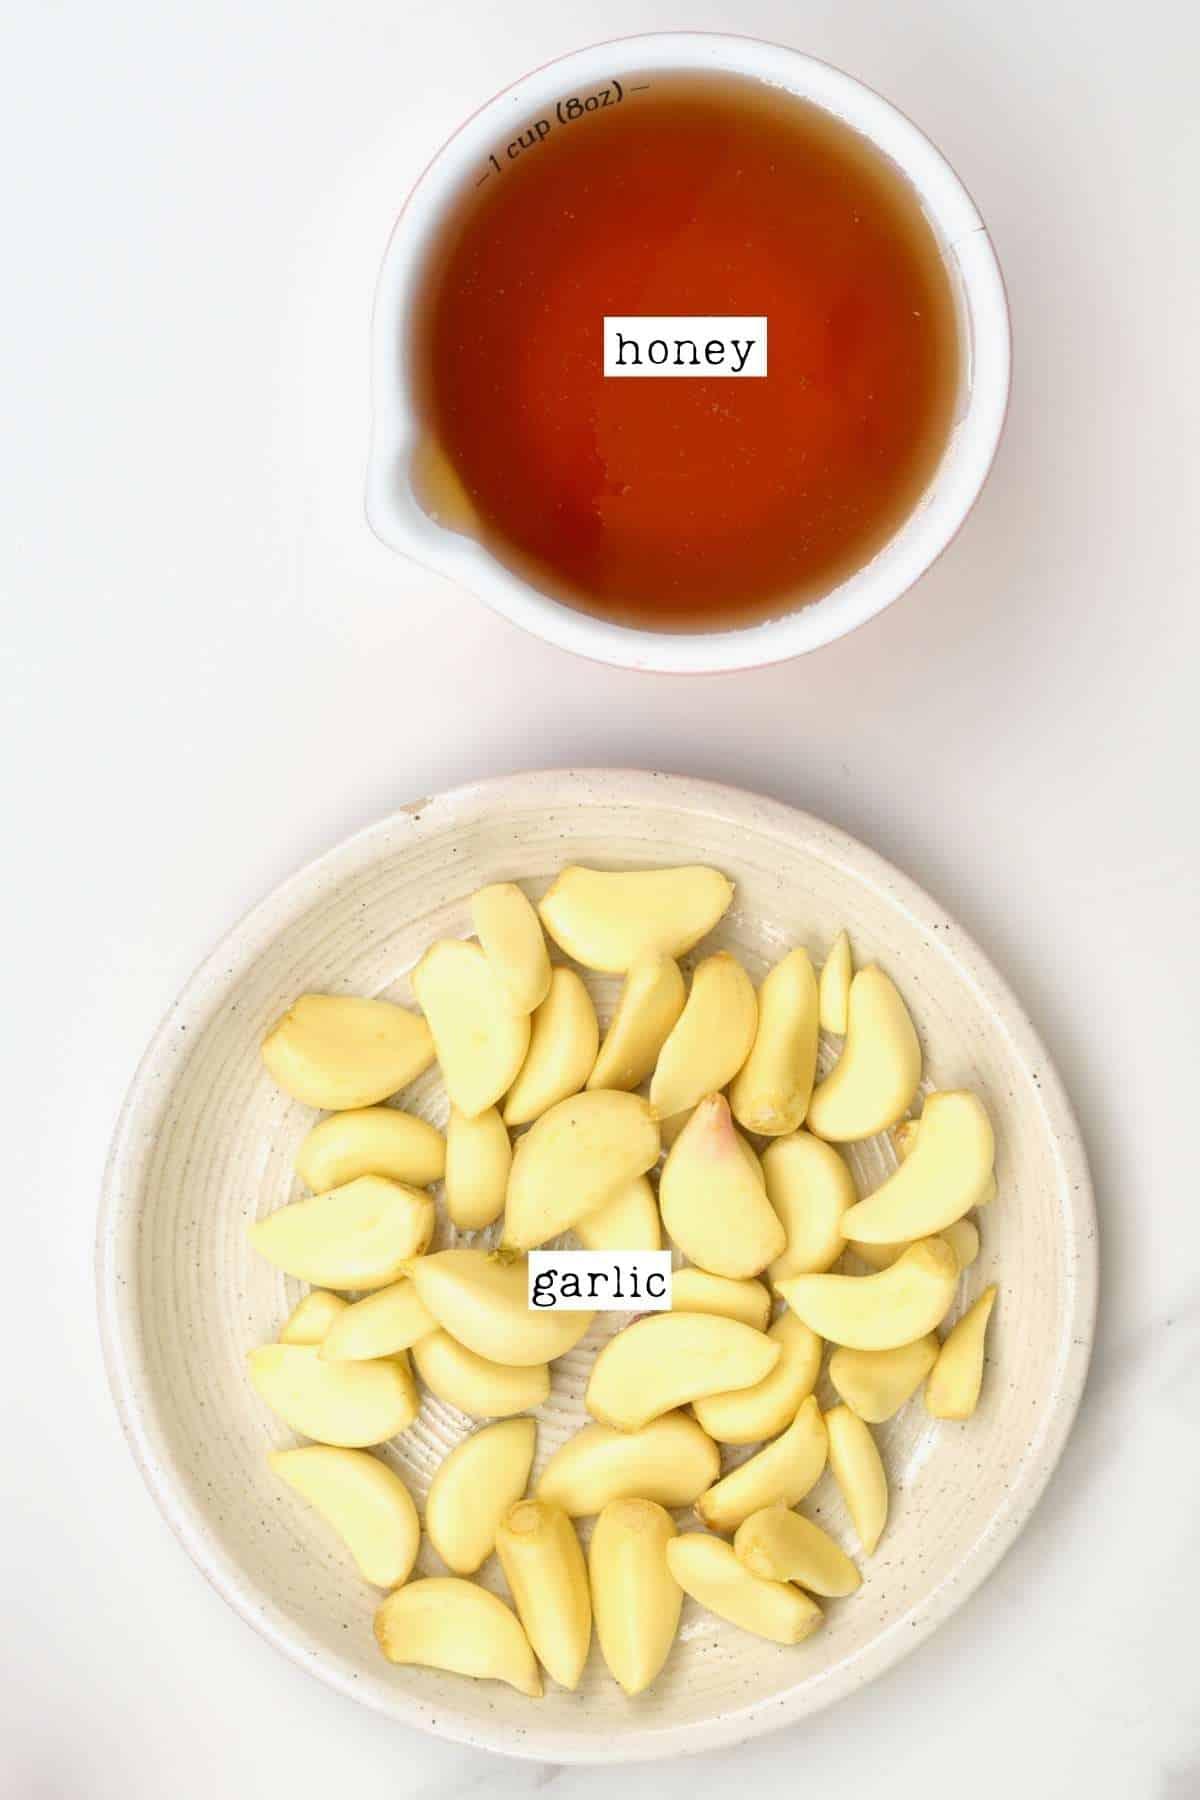 Ingredients for fermented honey garlic